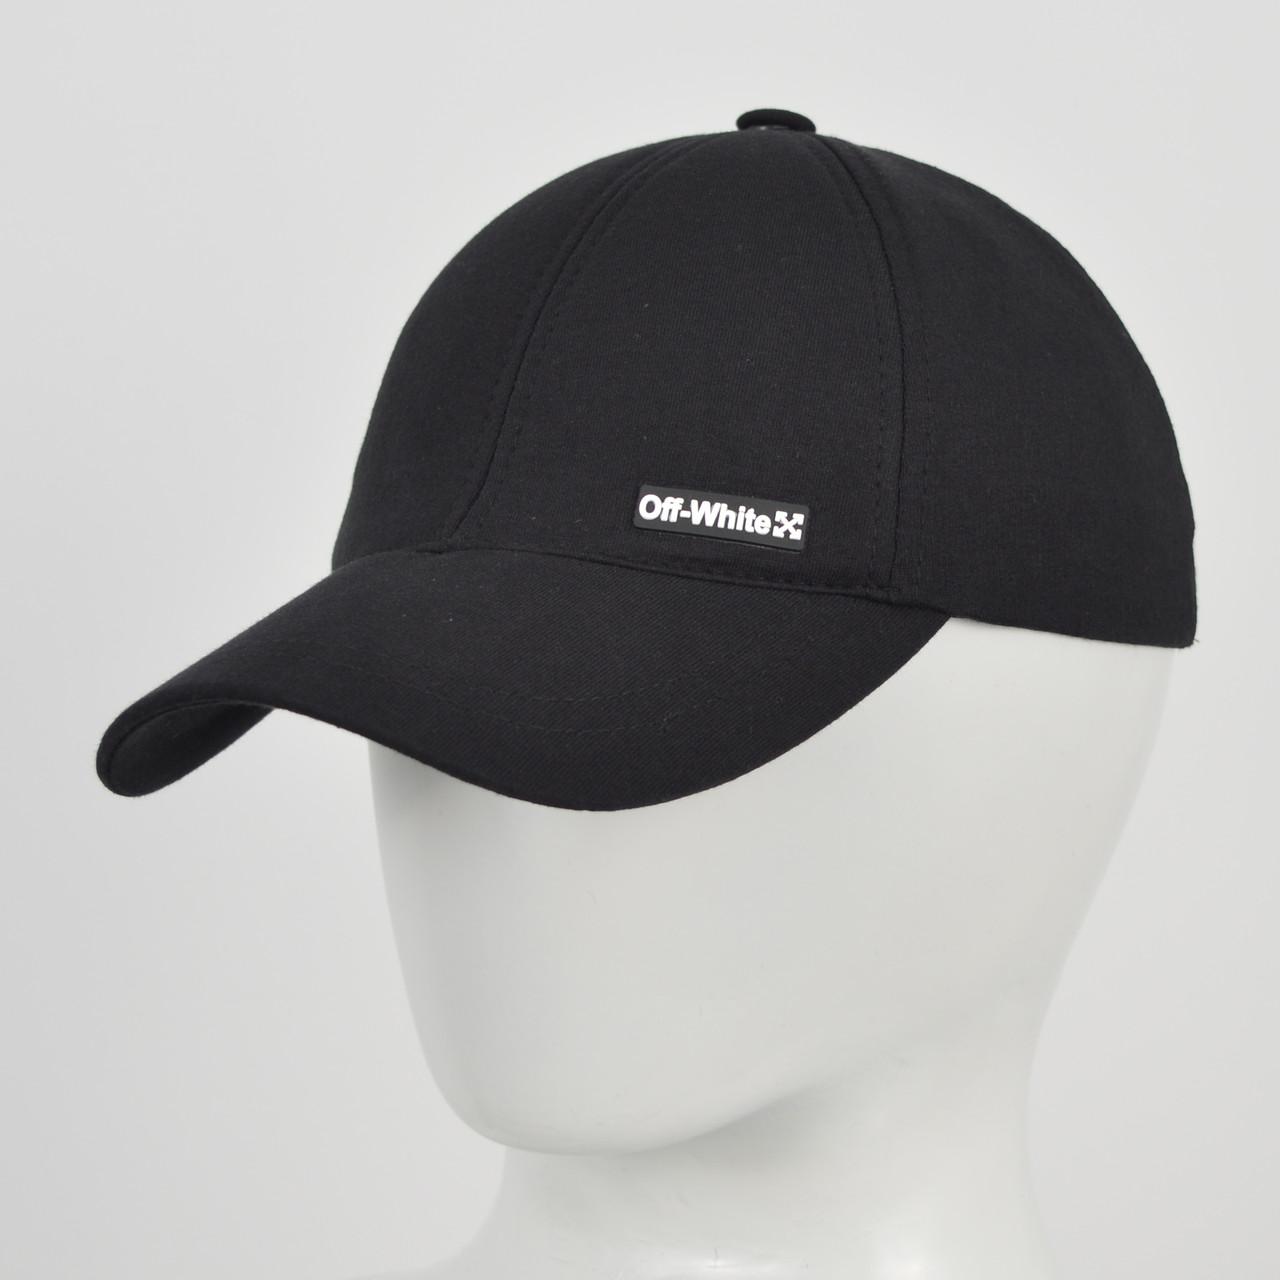 Бейсболка Off-White-2 (реплика) черный